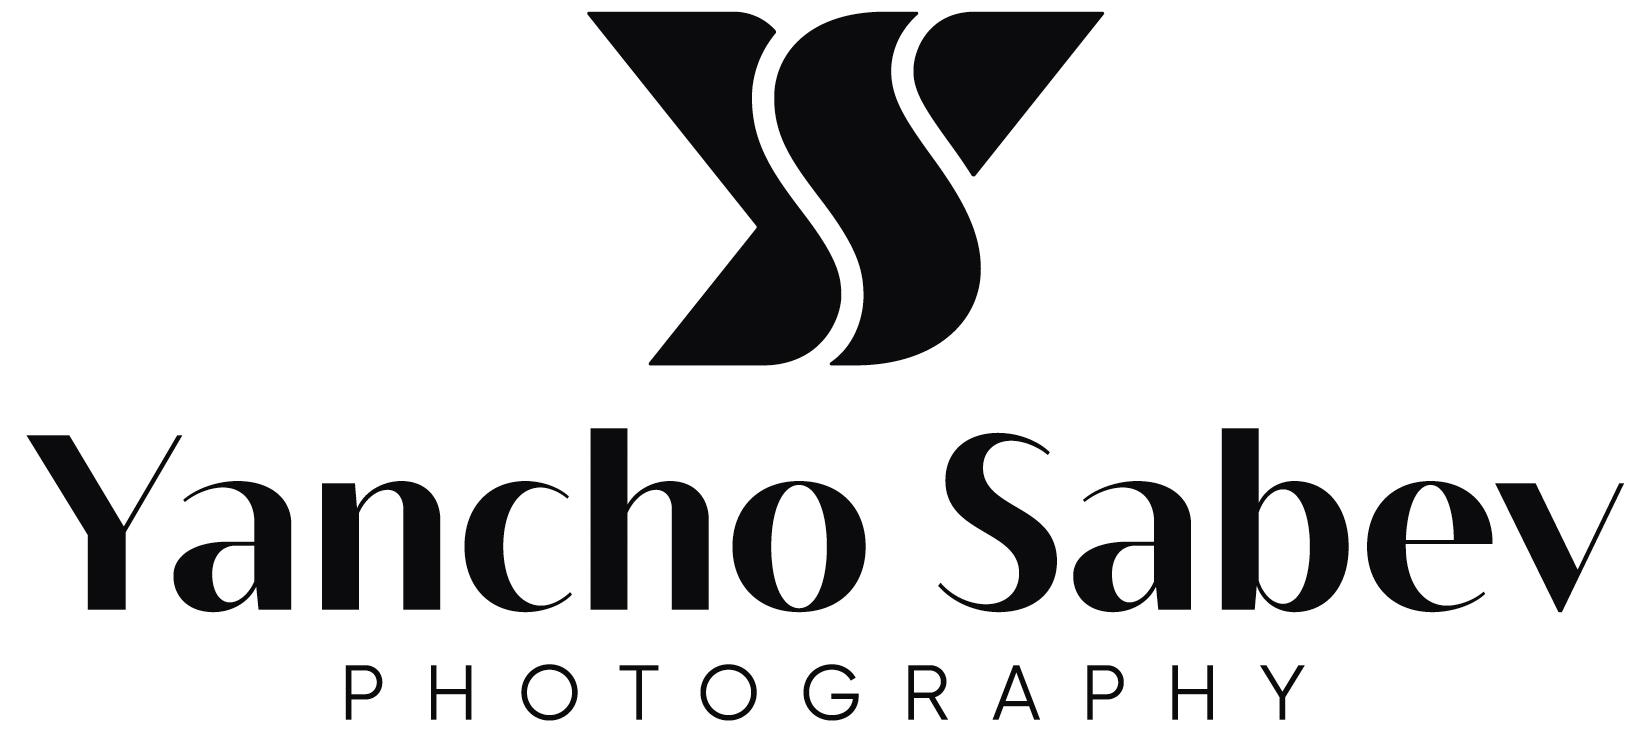 Yancho Sabev Photography